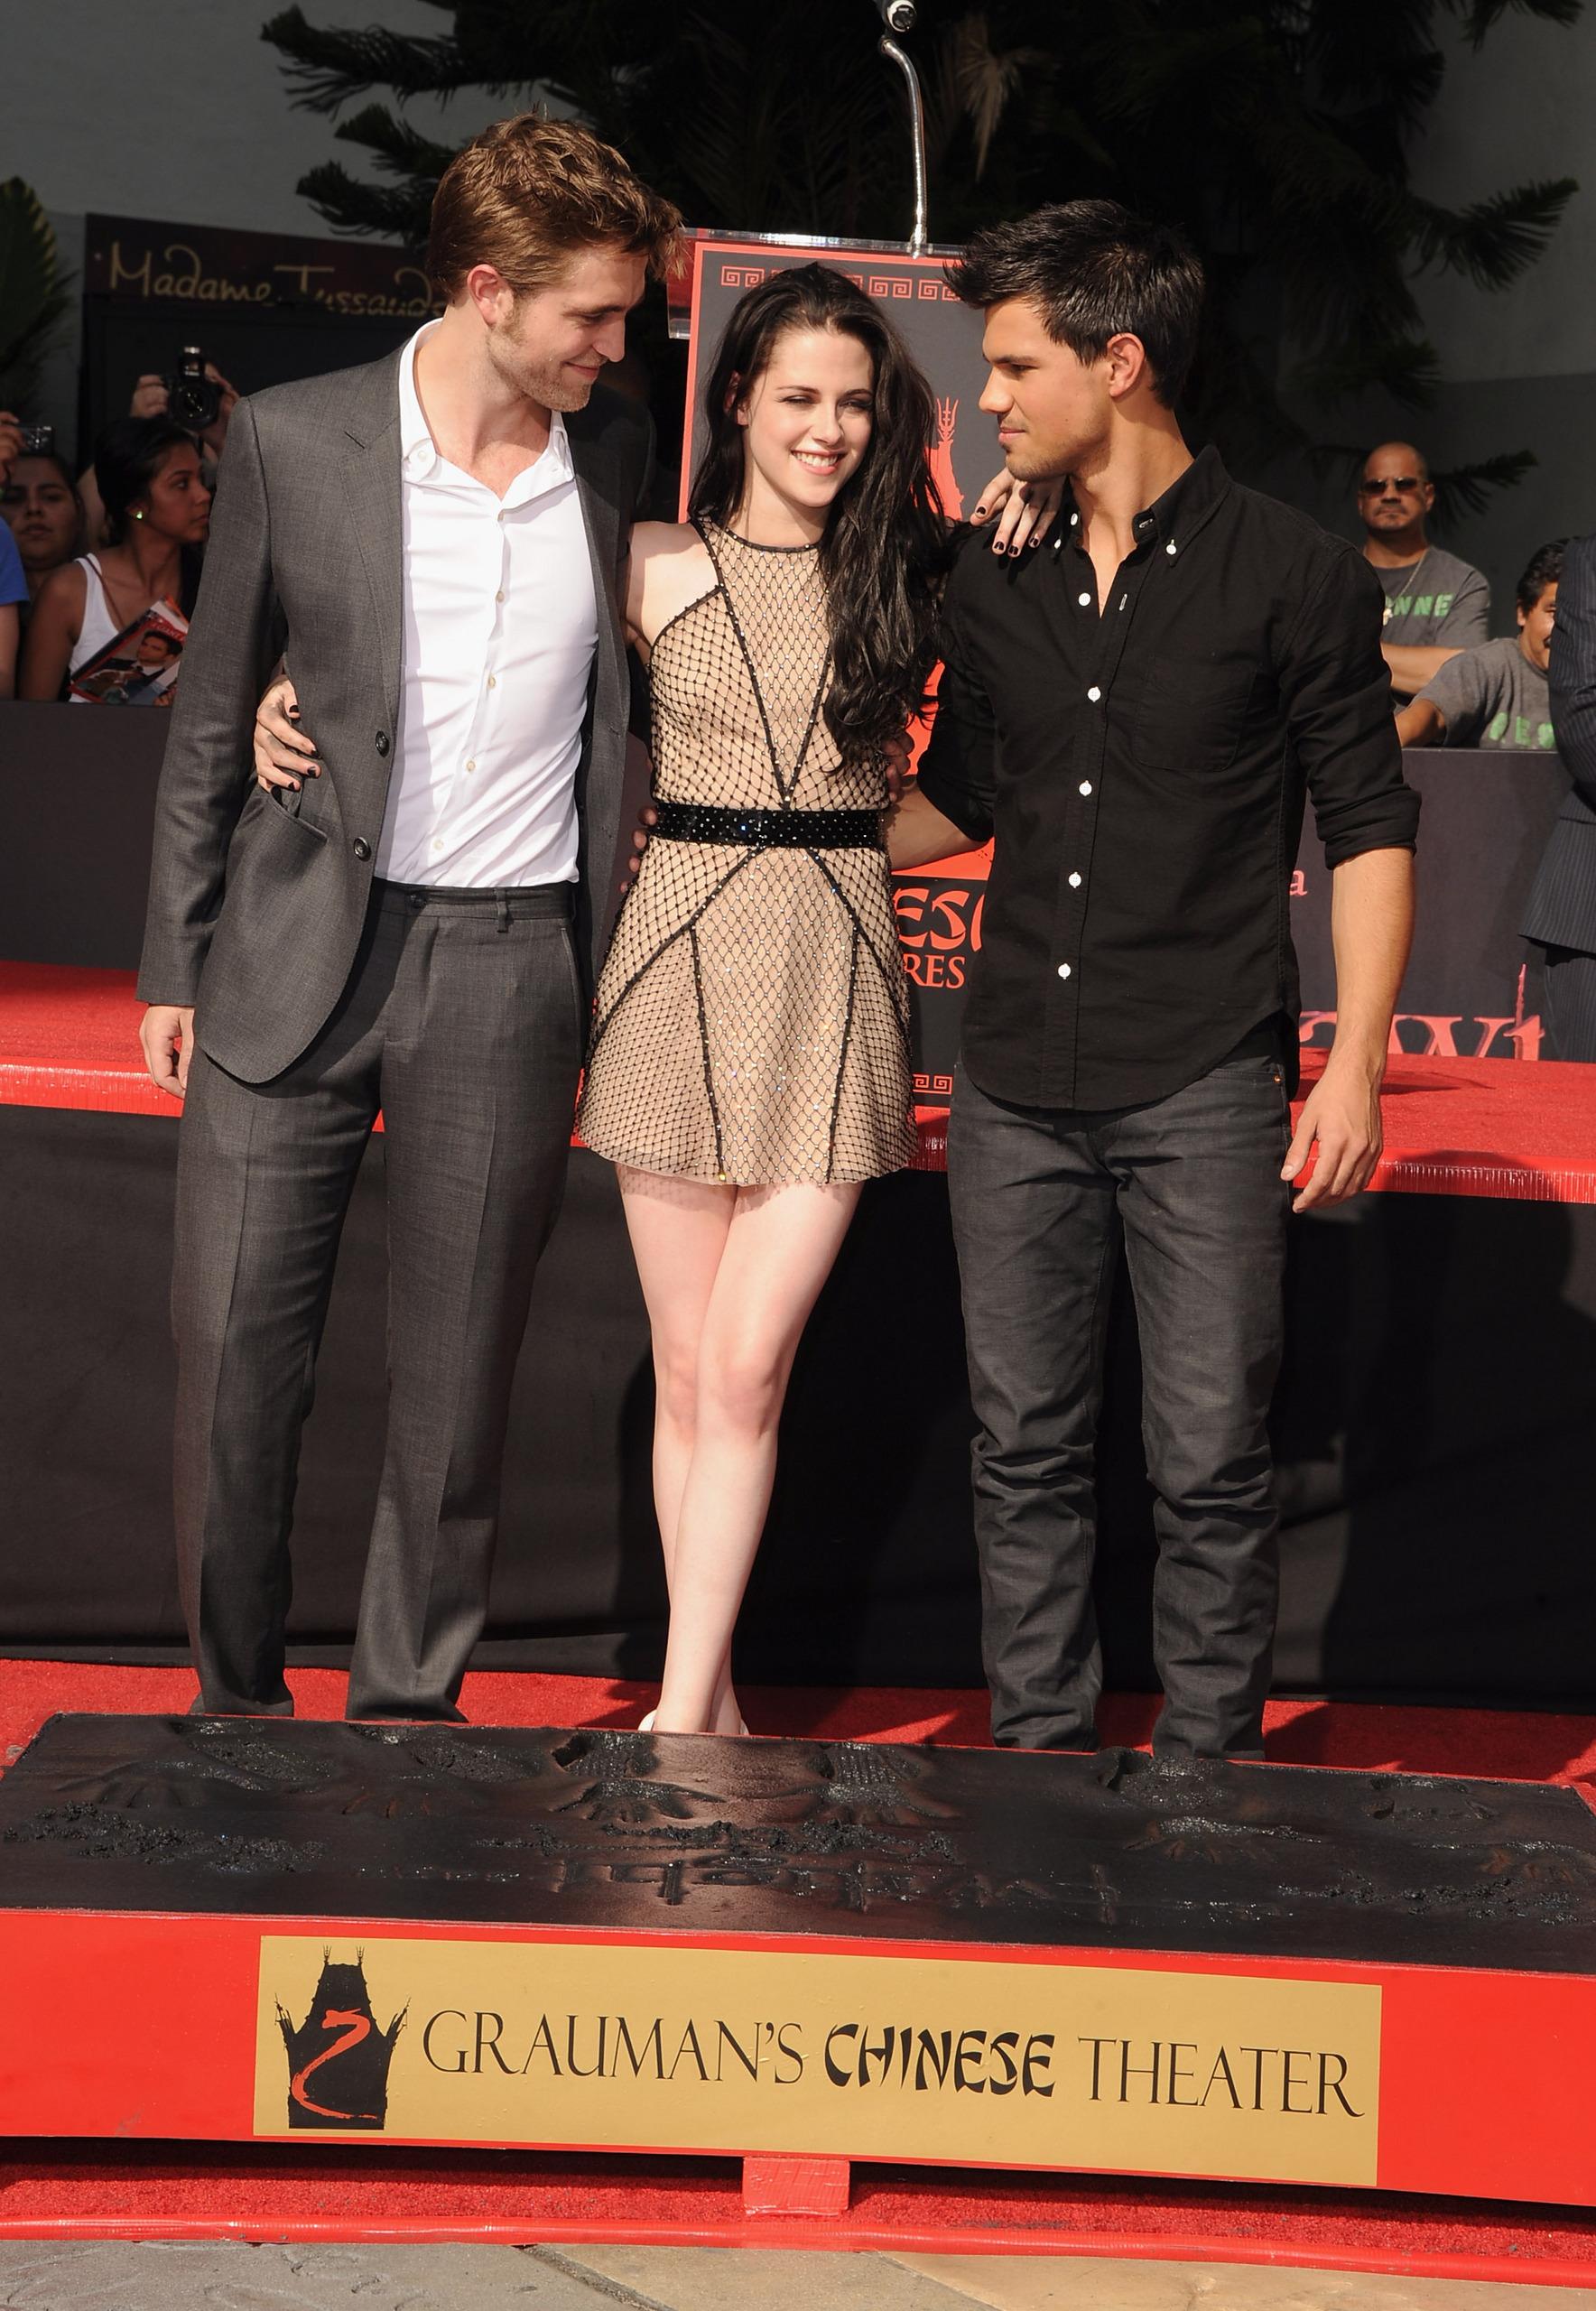 HQ's of Robert Pattinson, Kristen Stewart & Taylor Lautner at the handprint ceremony